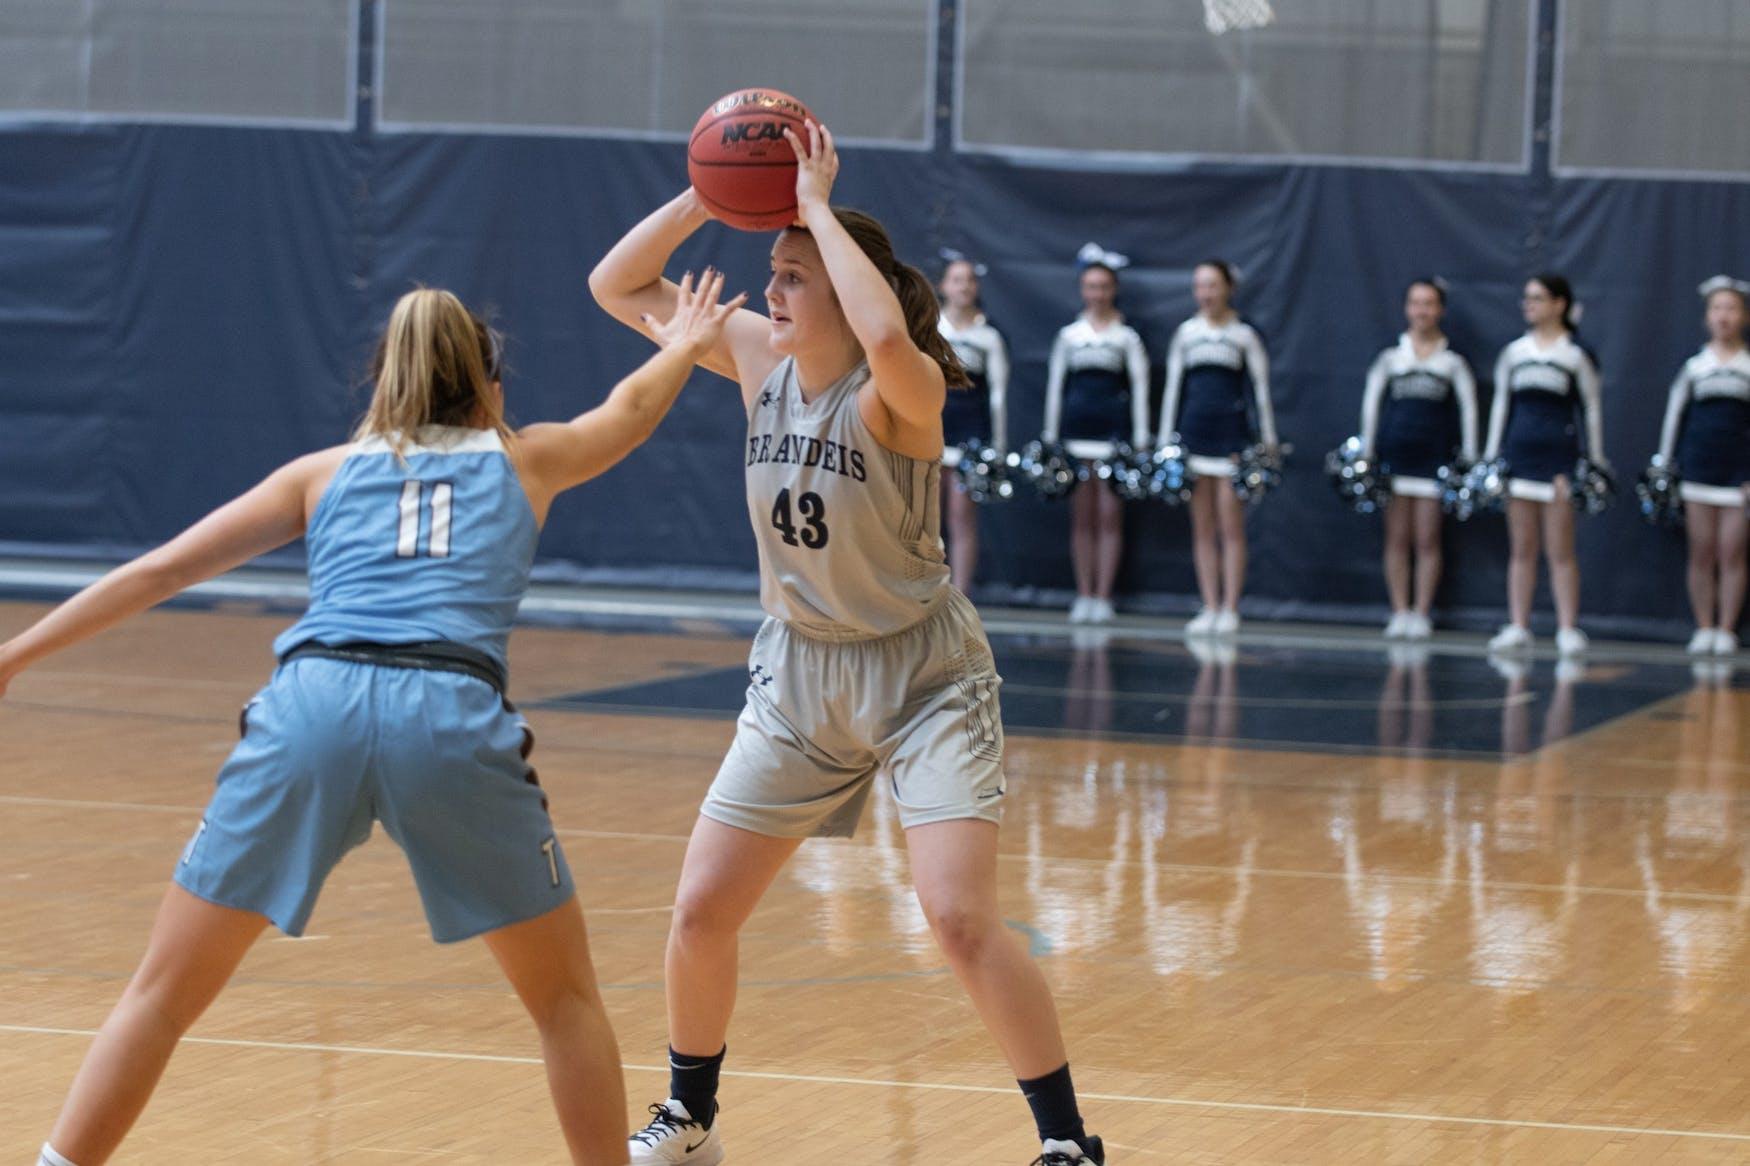 sports-wbasketball-11-23-19-nz-0049